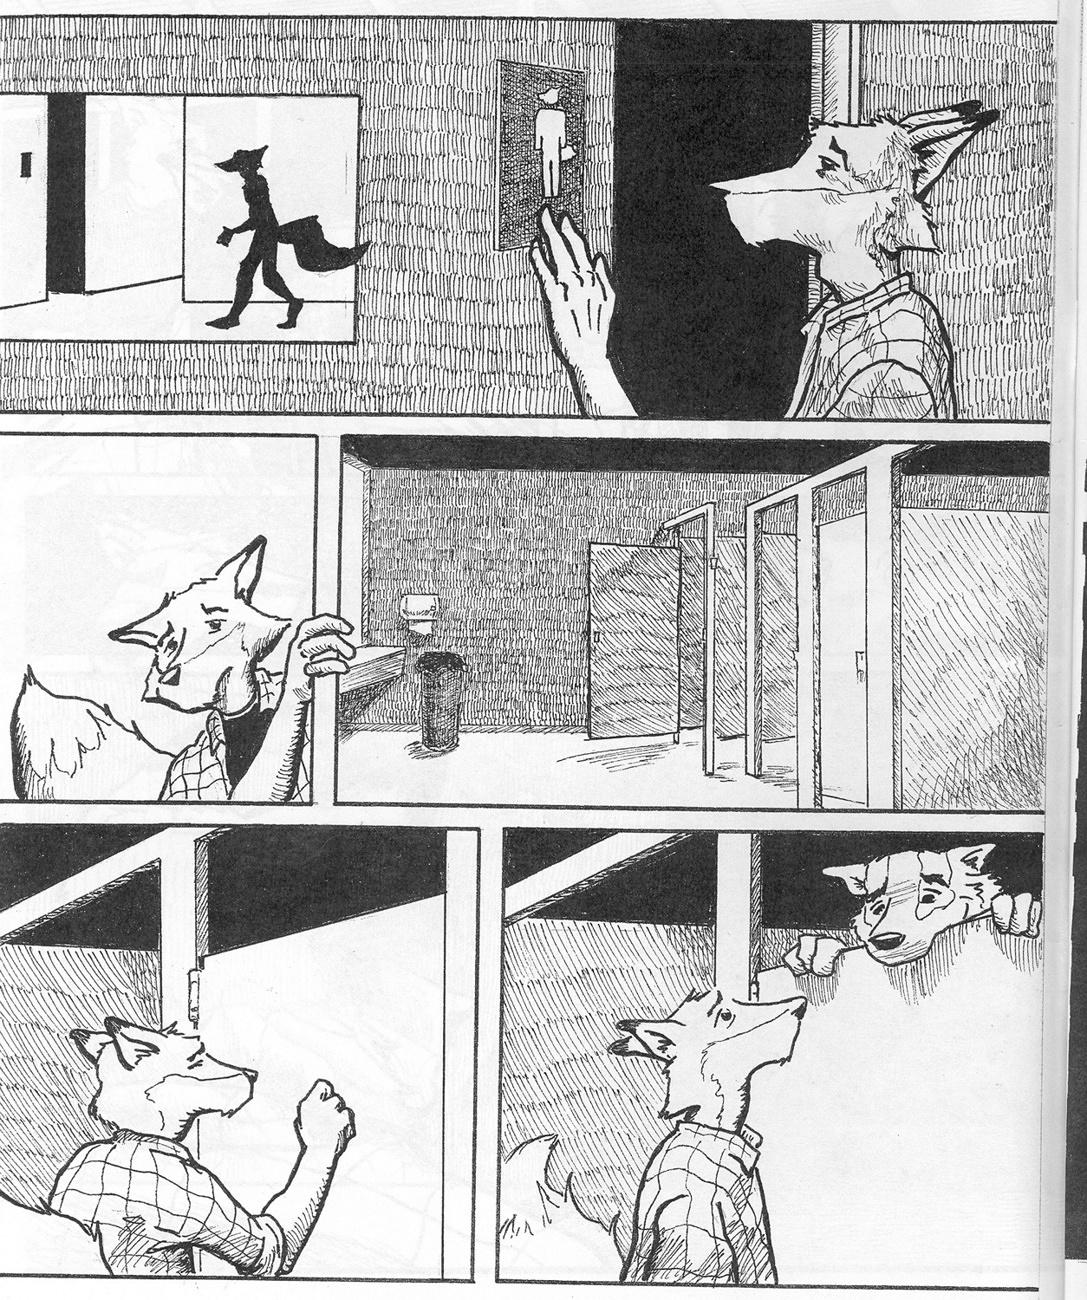 Woof gay furry comic